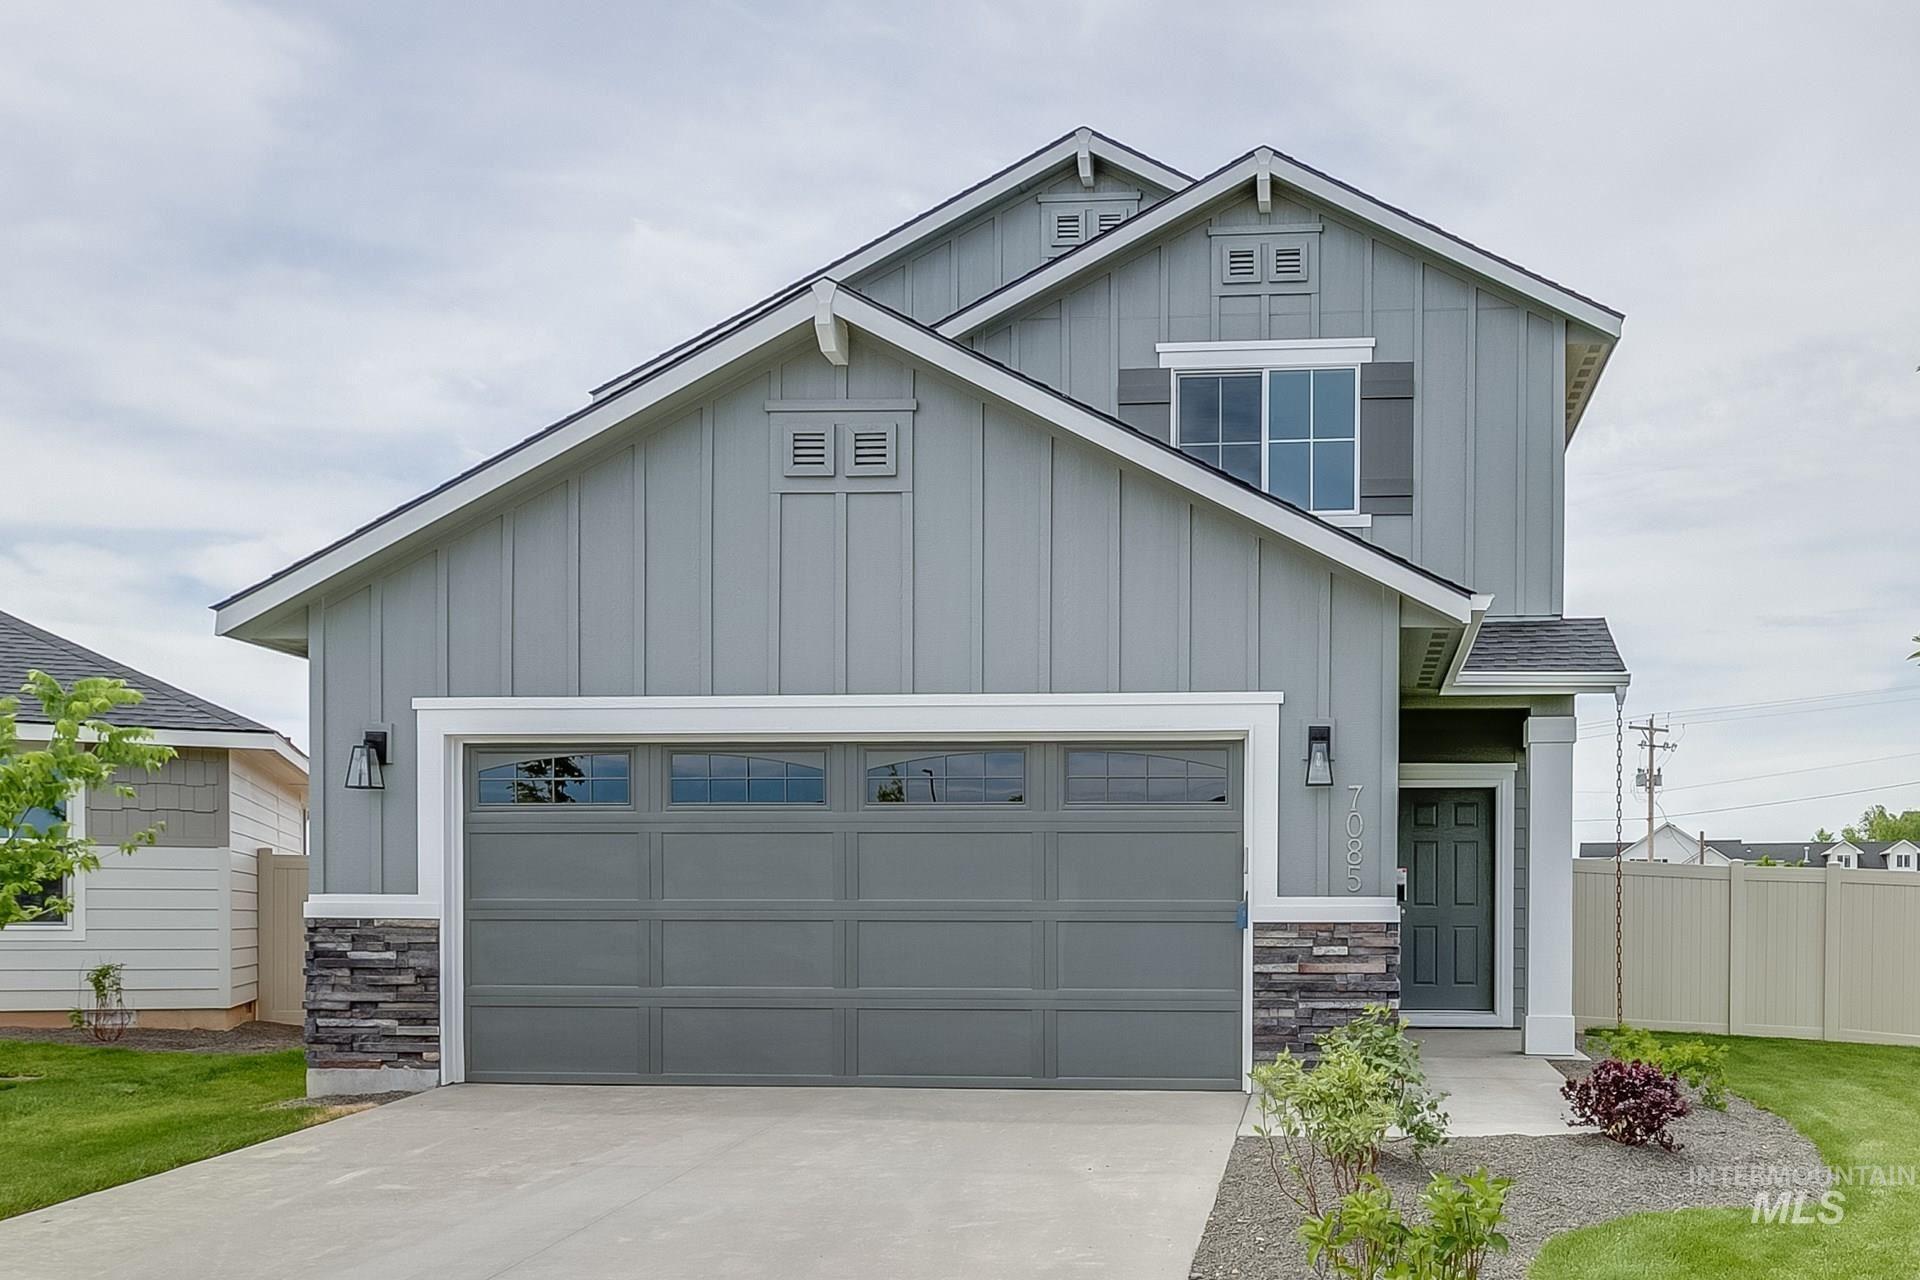 7085 S Birch Creek Ave, Meridian, ID 83642 - MLS#: 98765297